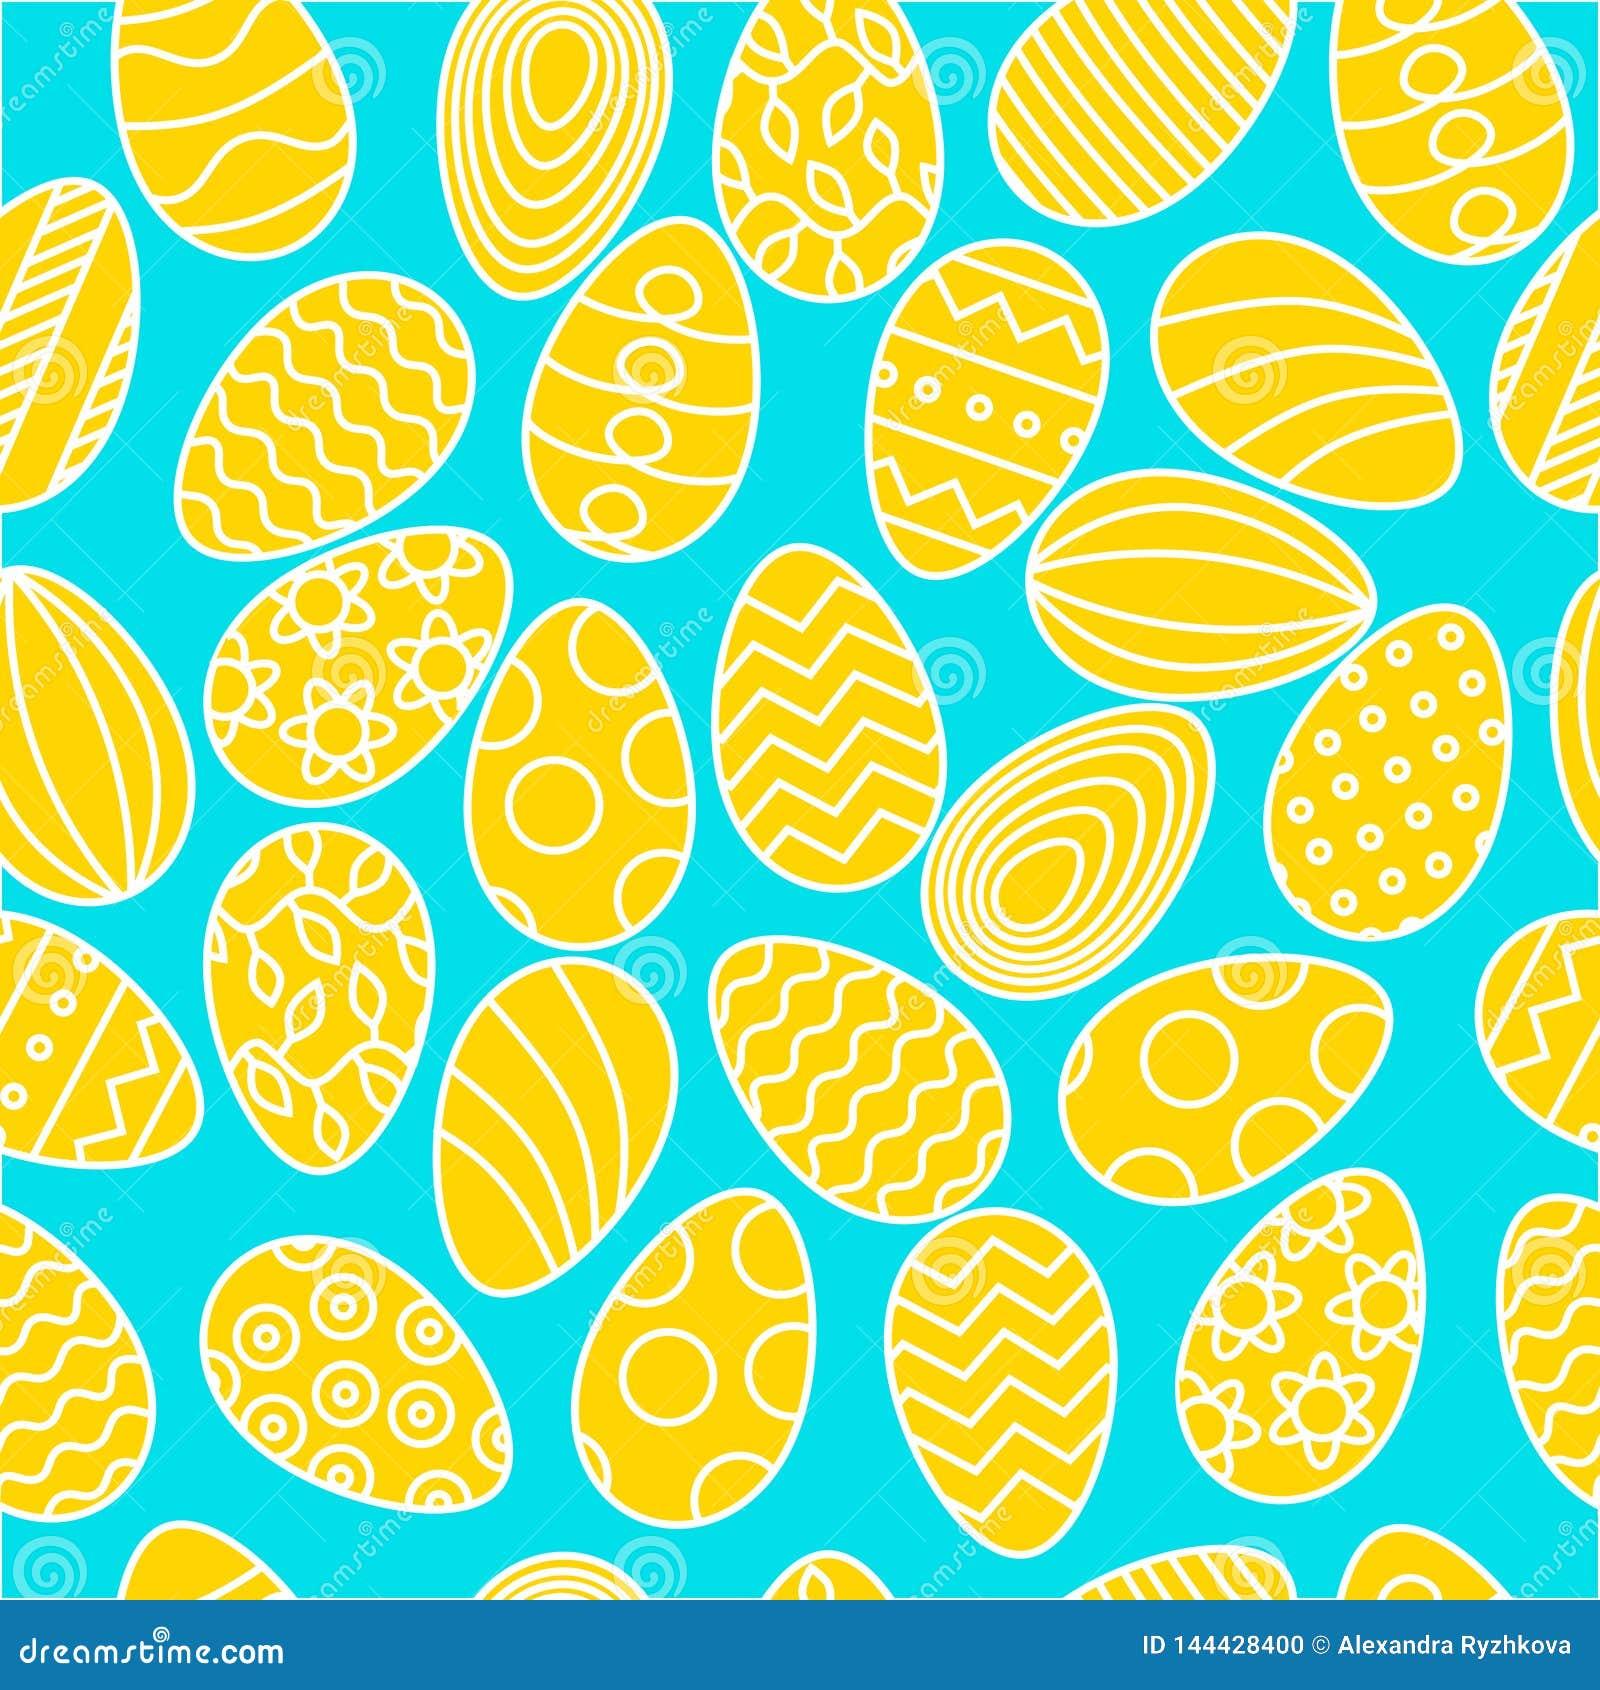 Color eggs pattern on light blue background for Easter banner